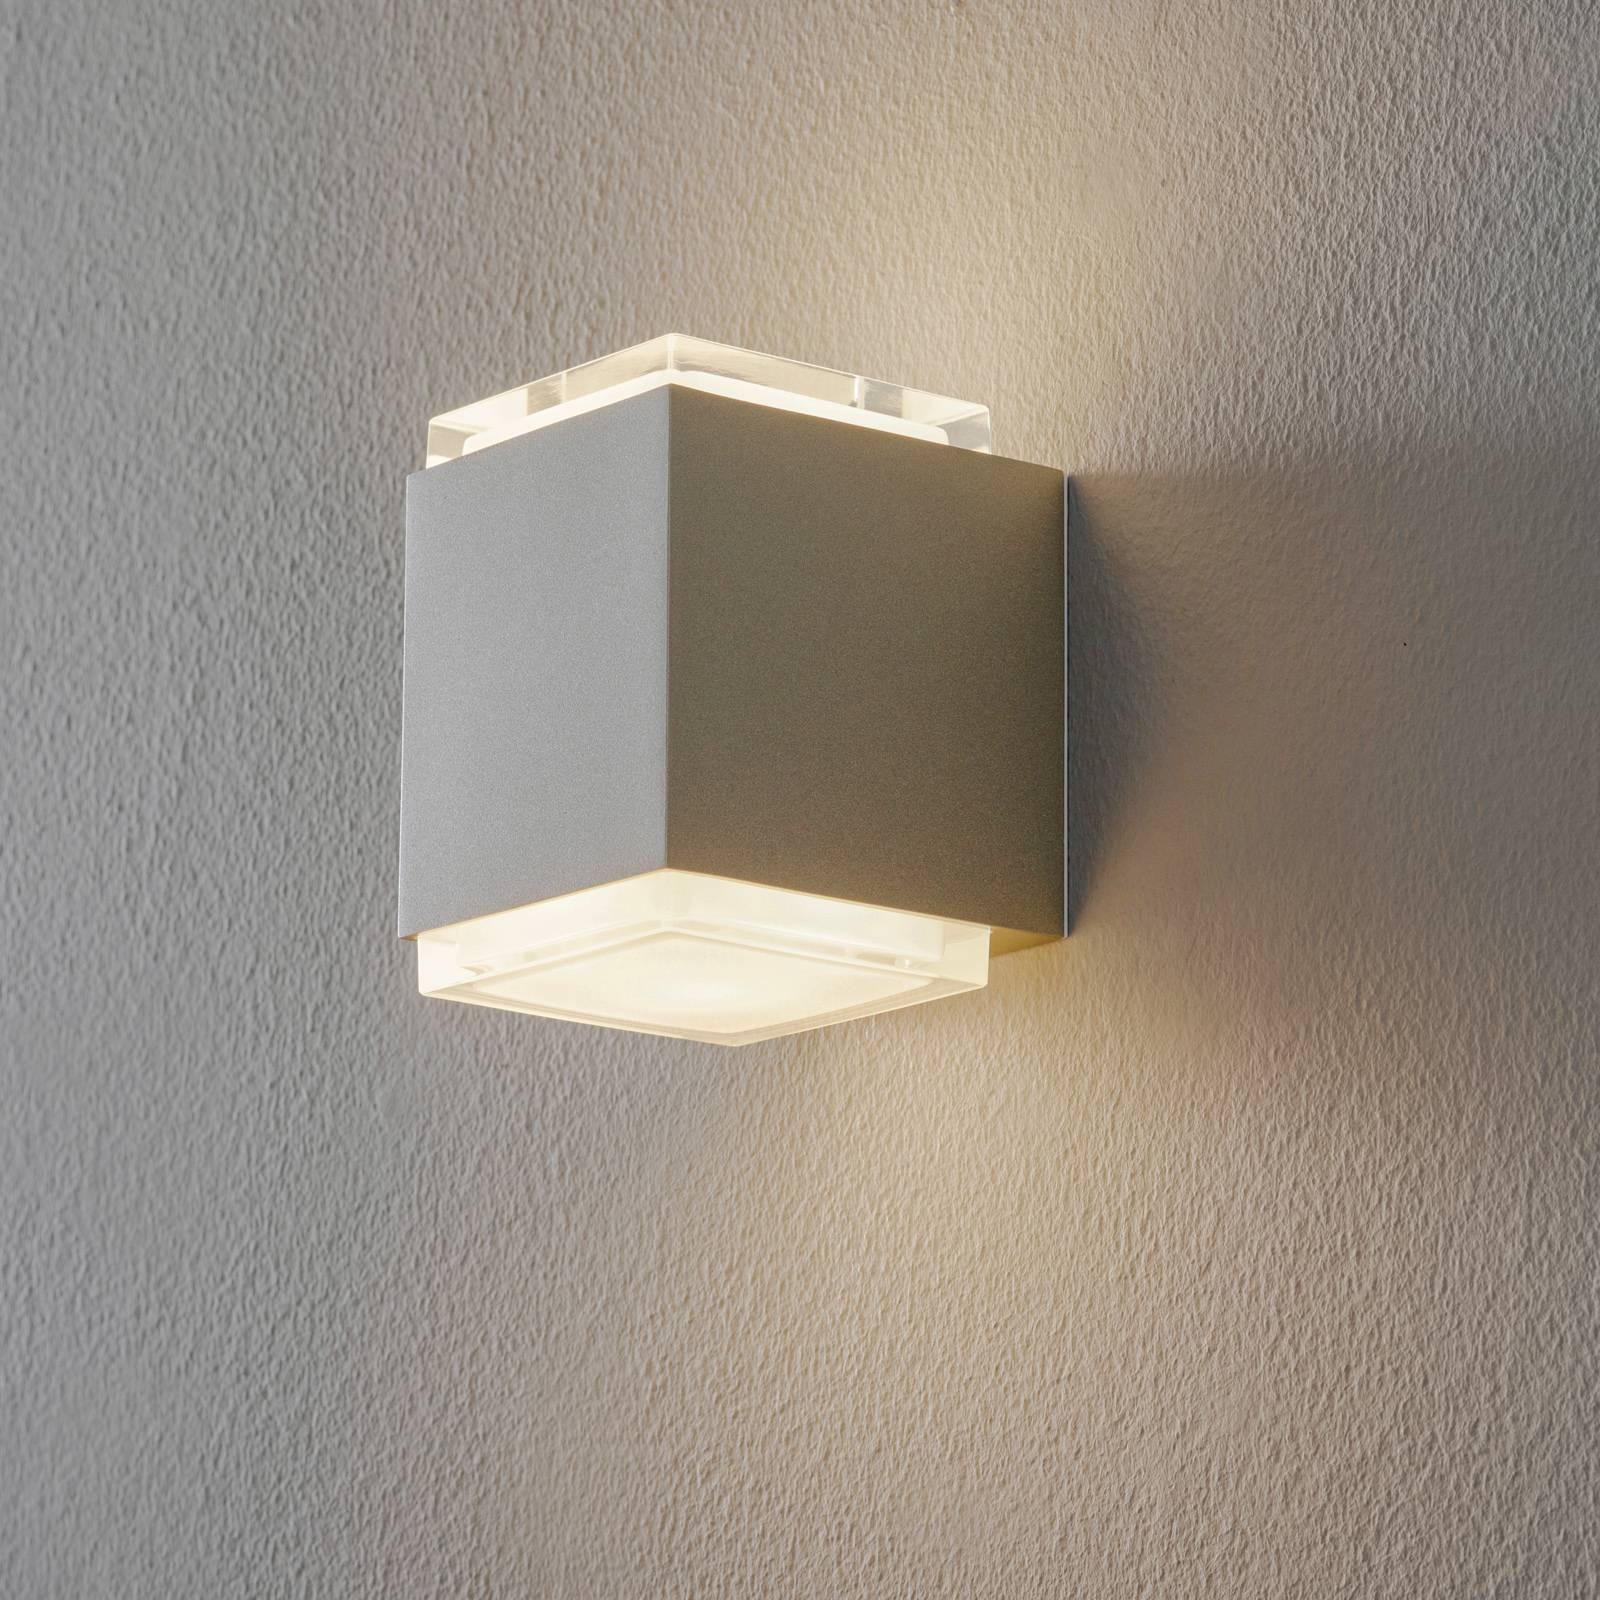 BEGA 50063 LED-seinävalaisin 3000K 9 cm palladium